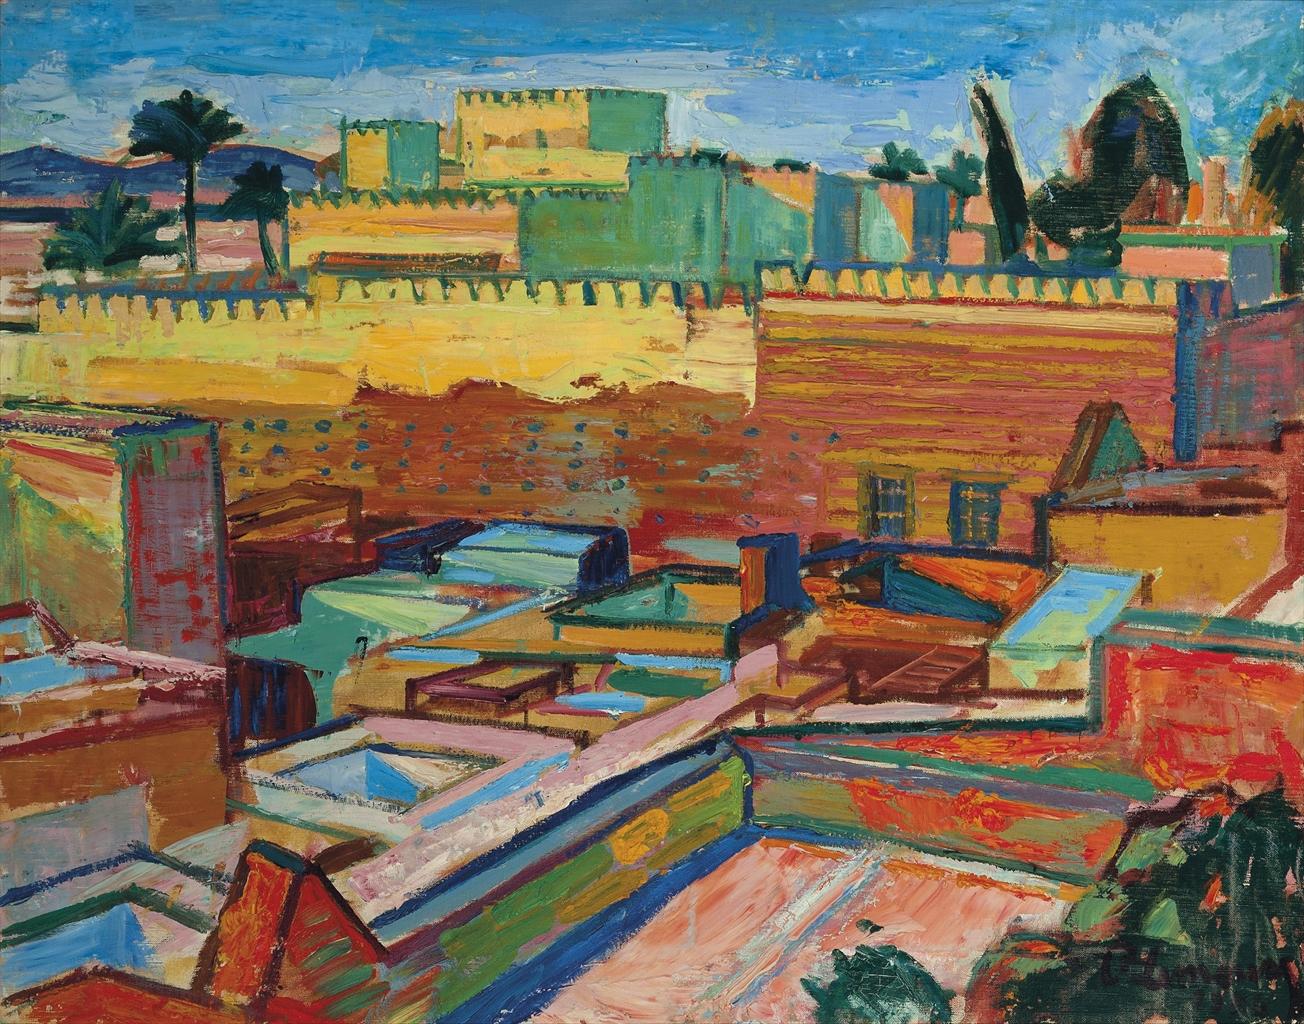 Roger Marcel Limouse-Terrasses a Marrakech-1954